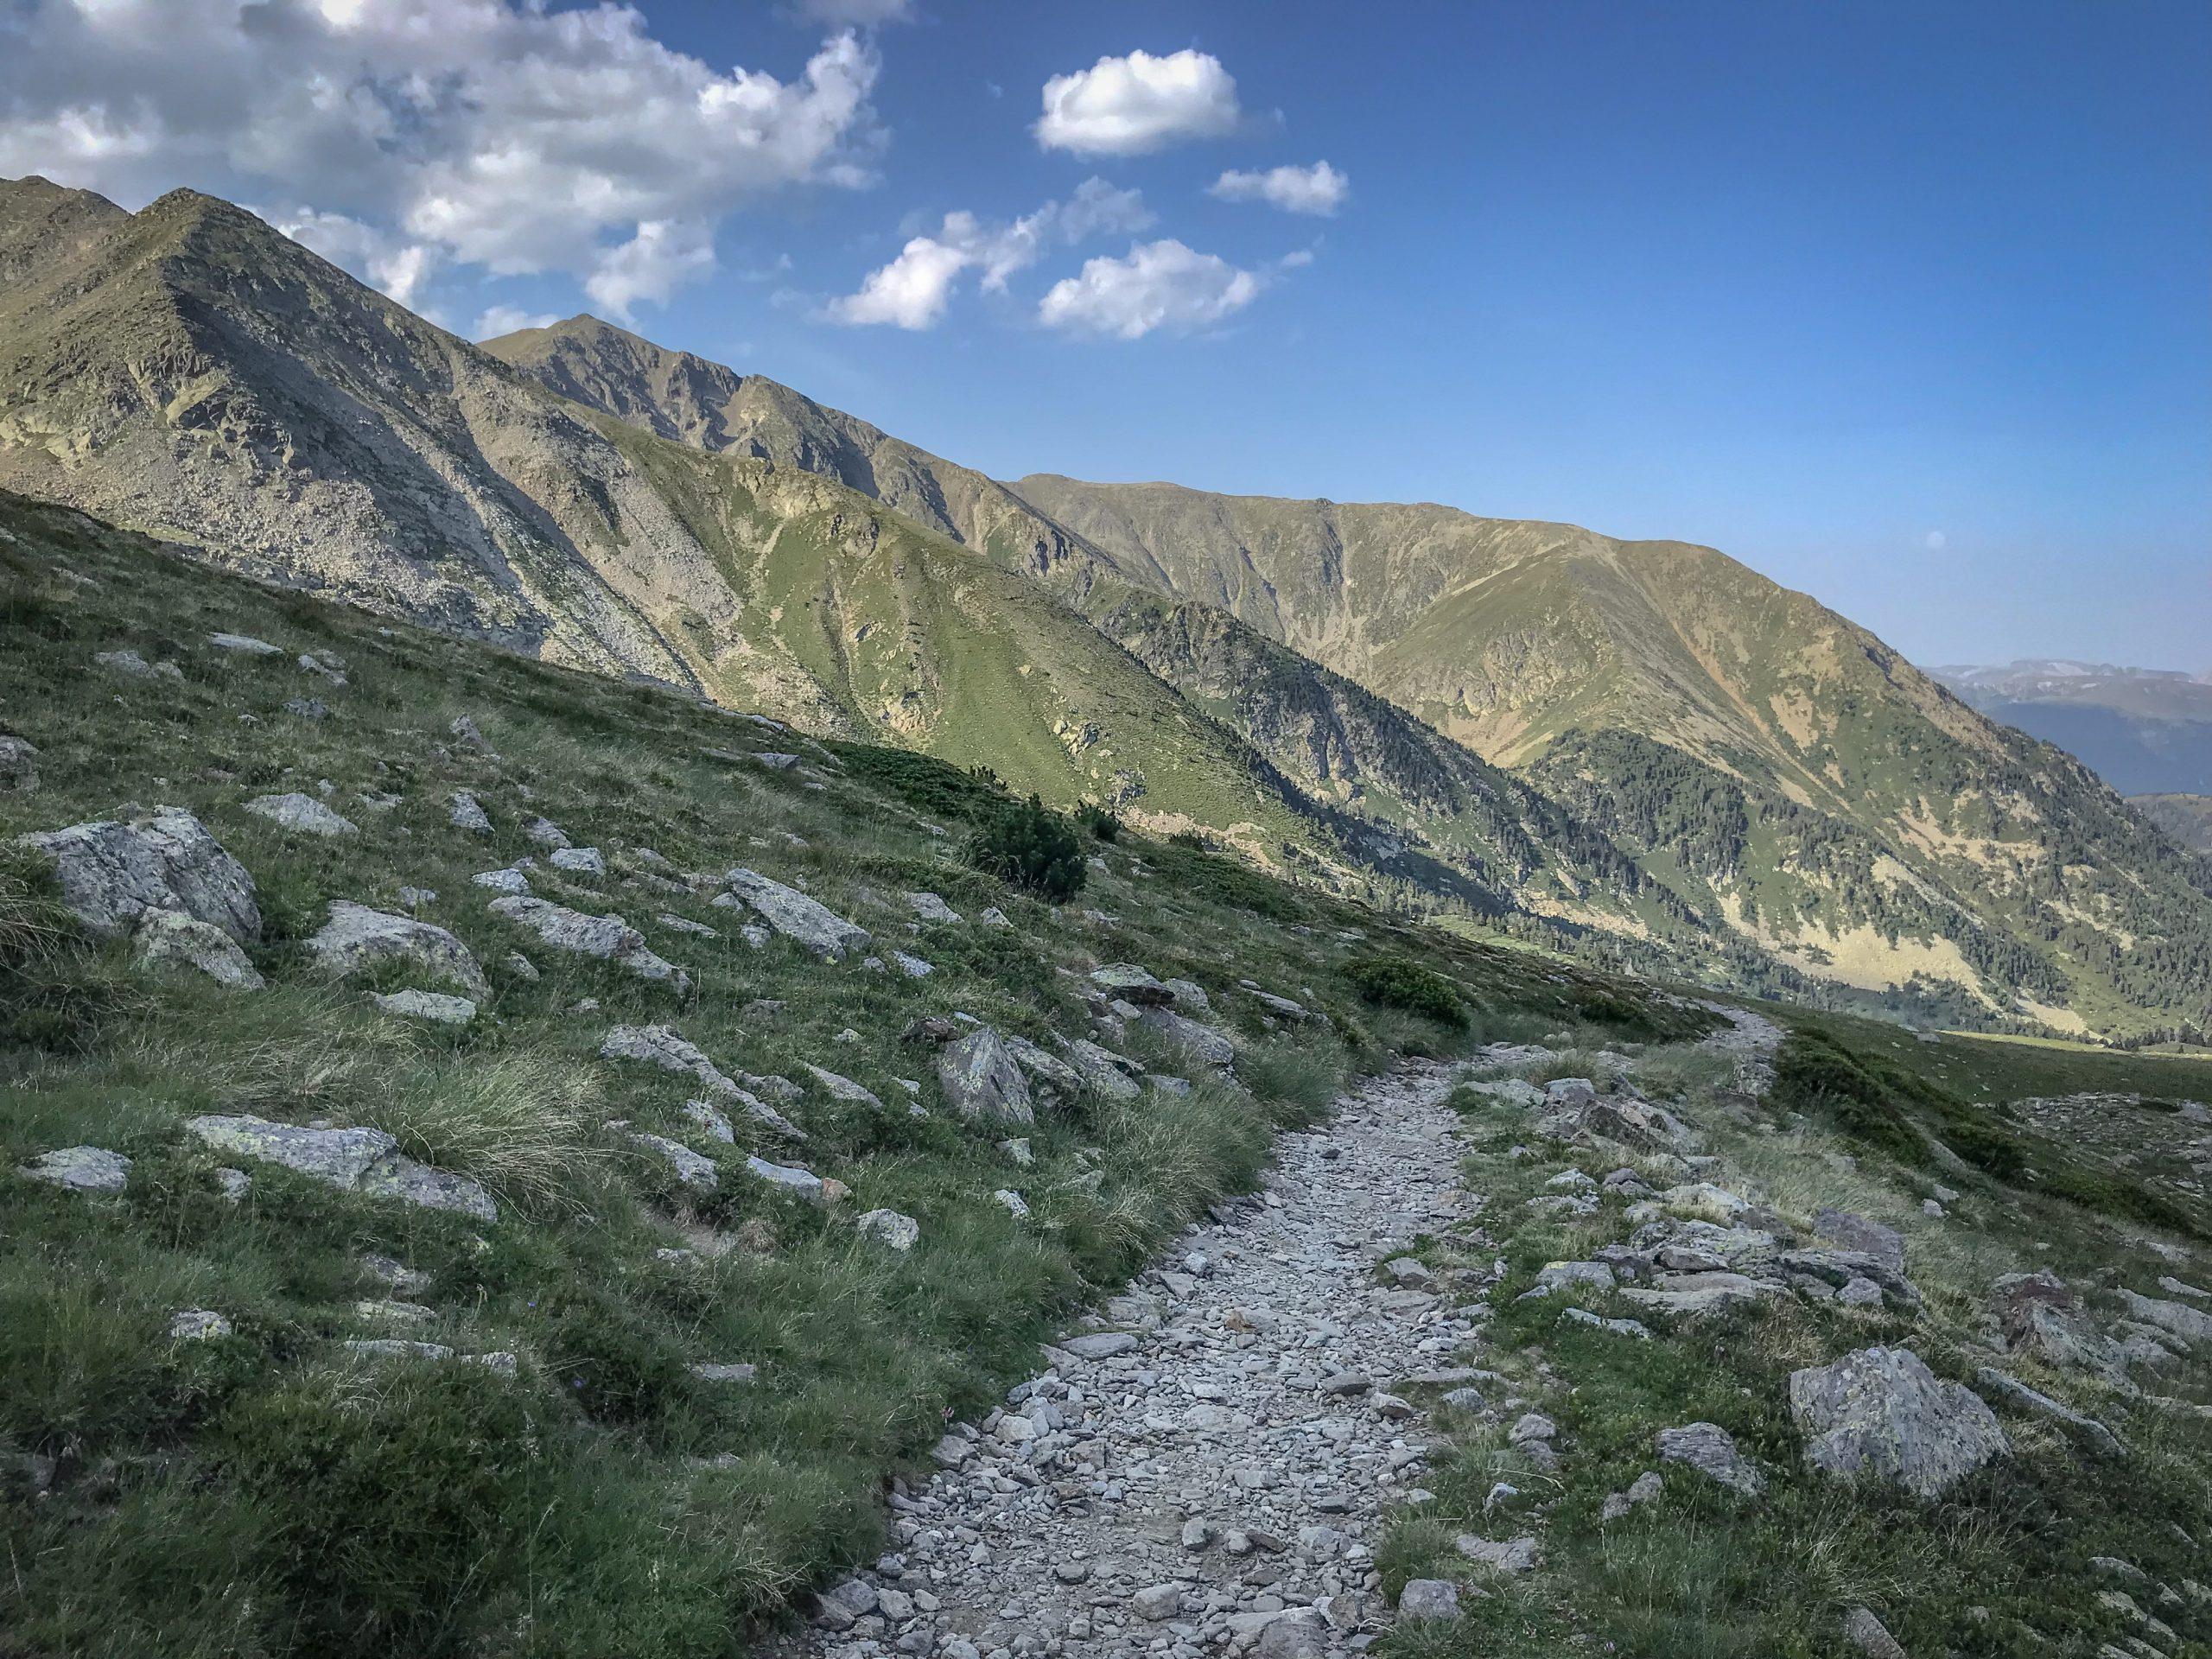 sentier de randonnée pic du canigou